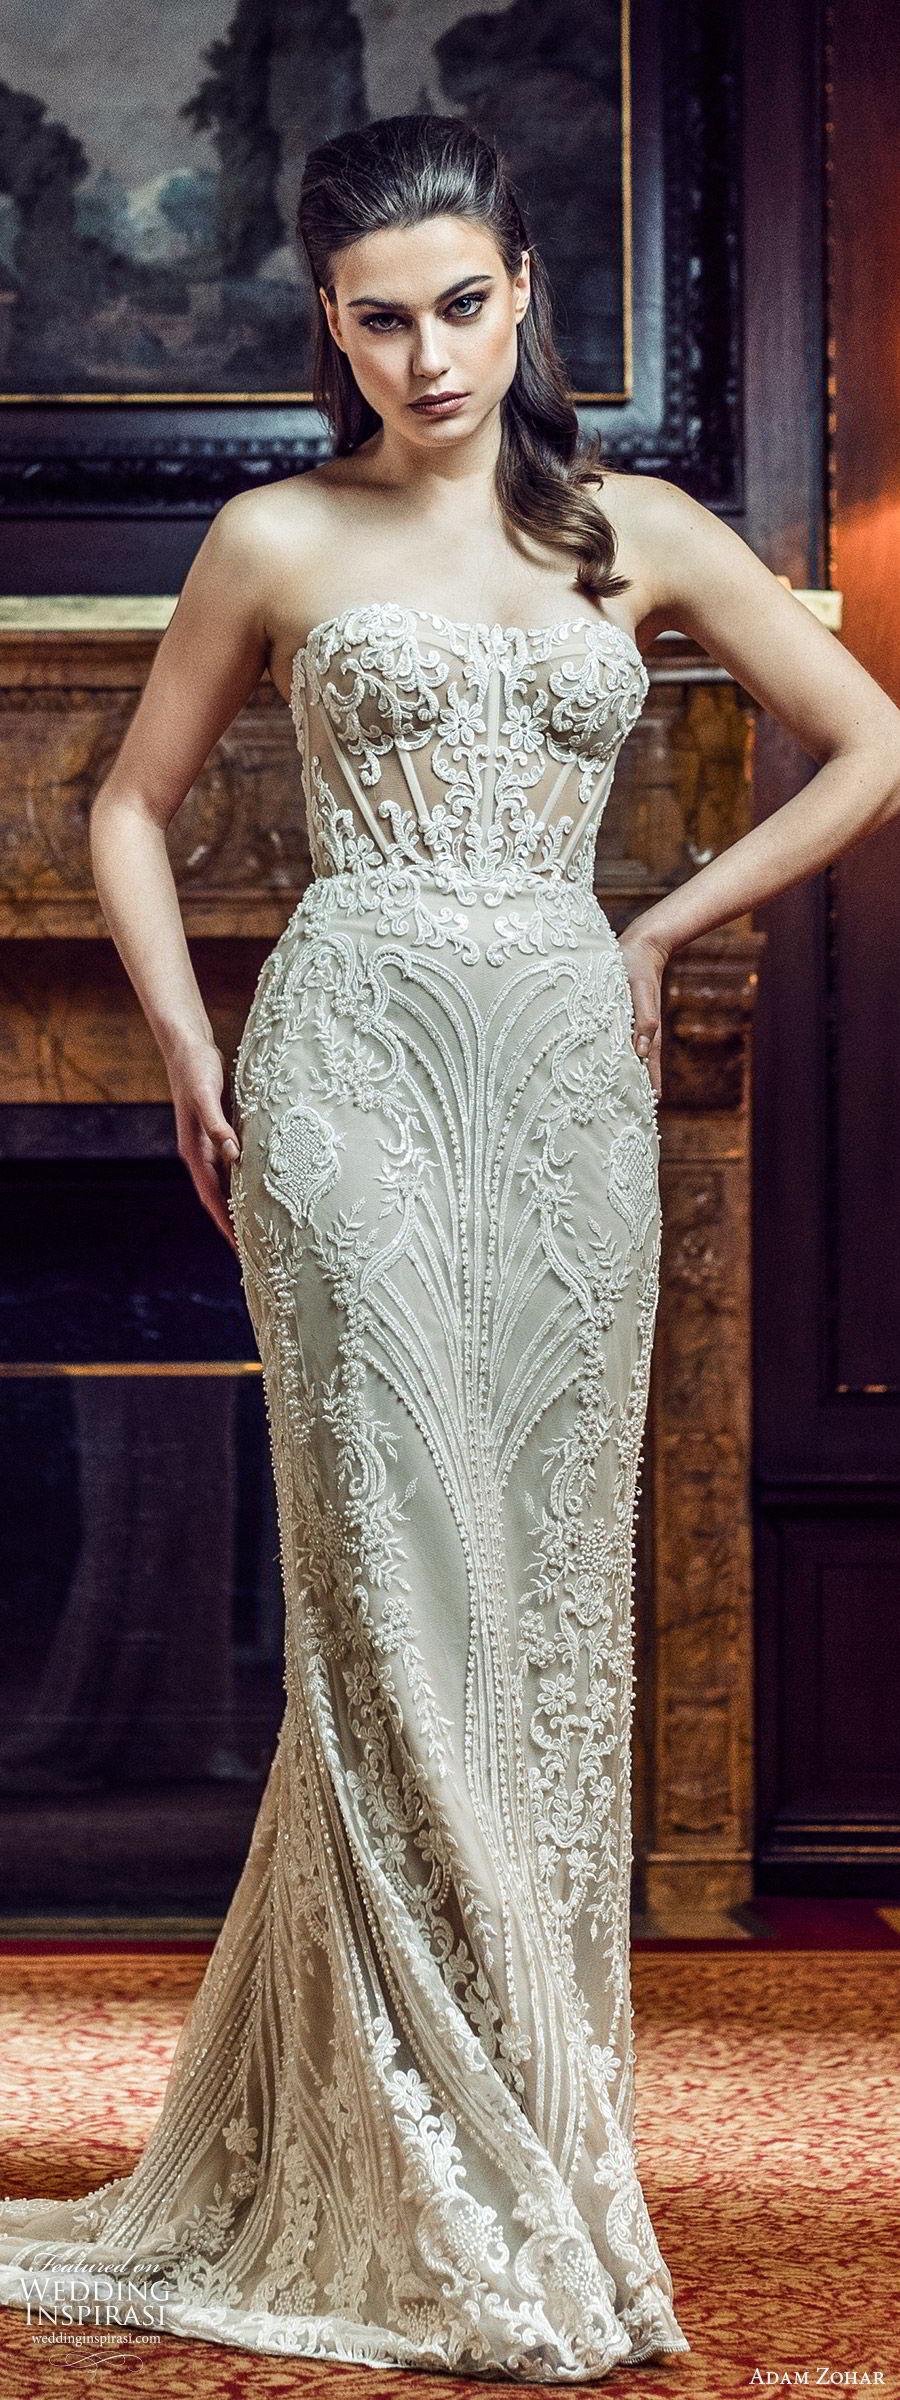 adam zohar 2020 bridal strapless sweetheart fully embellished lace sheath wedding dress b(11) glam elegant chapel train mv